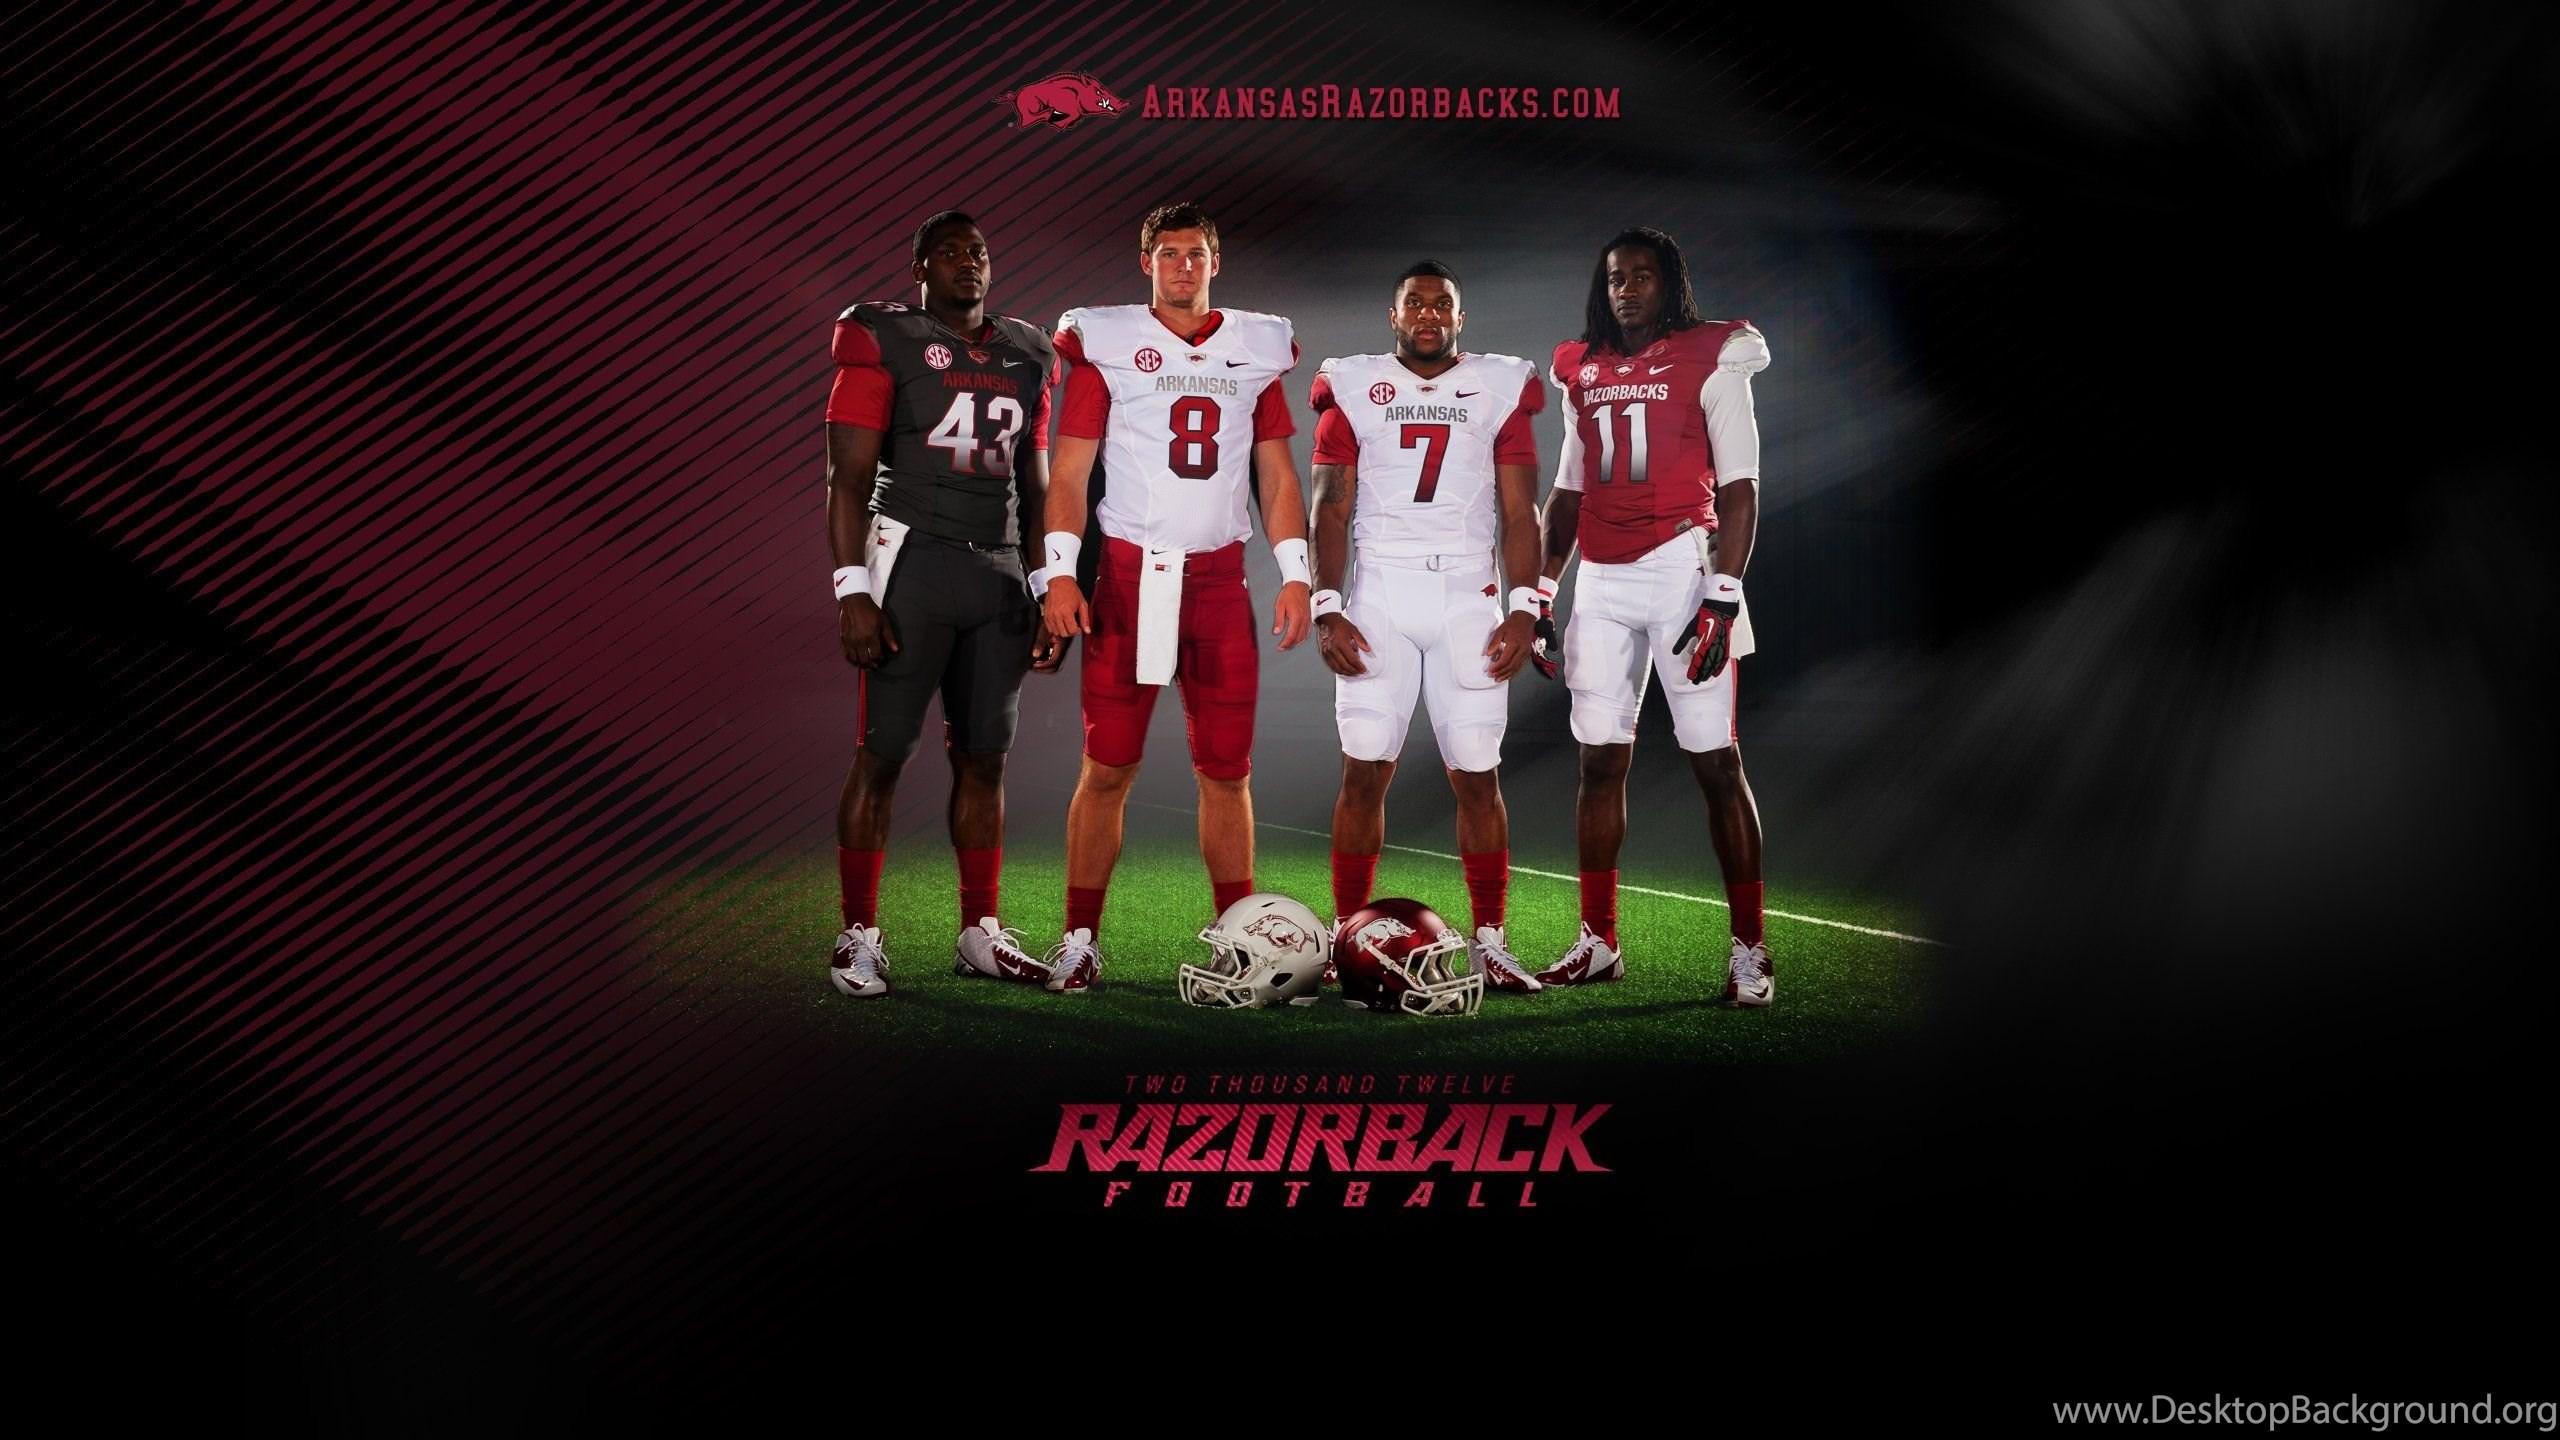 ARKANSAS RAZORBACKS College Football Wallpapers Desktop Background